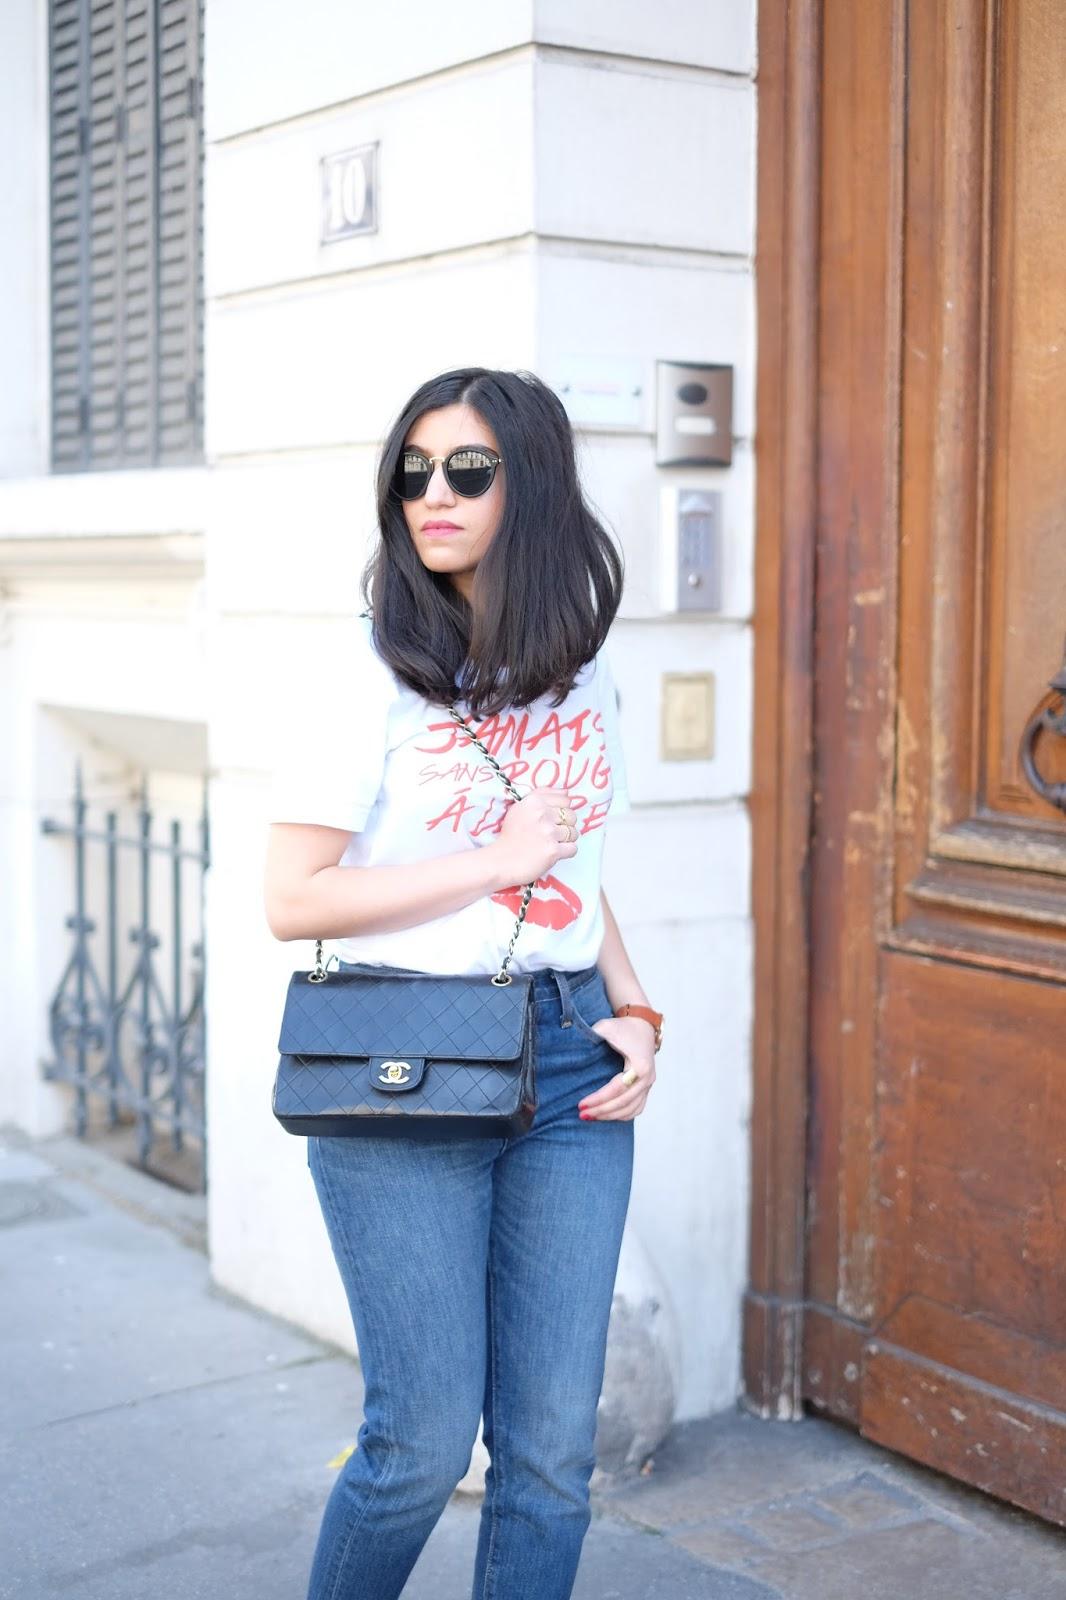 blogueuse mode, blog mode, amenidaily, sac chanel, modeuse, blogueuse lyonnaise